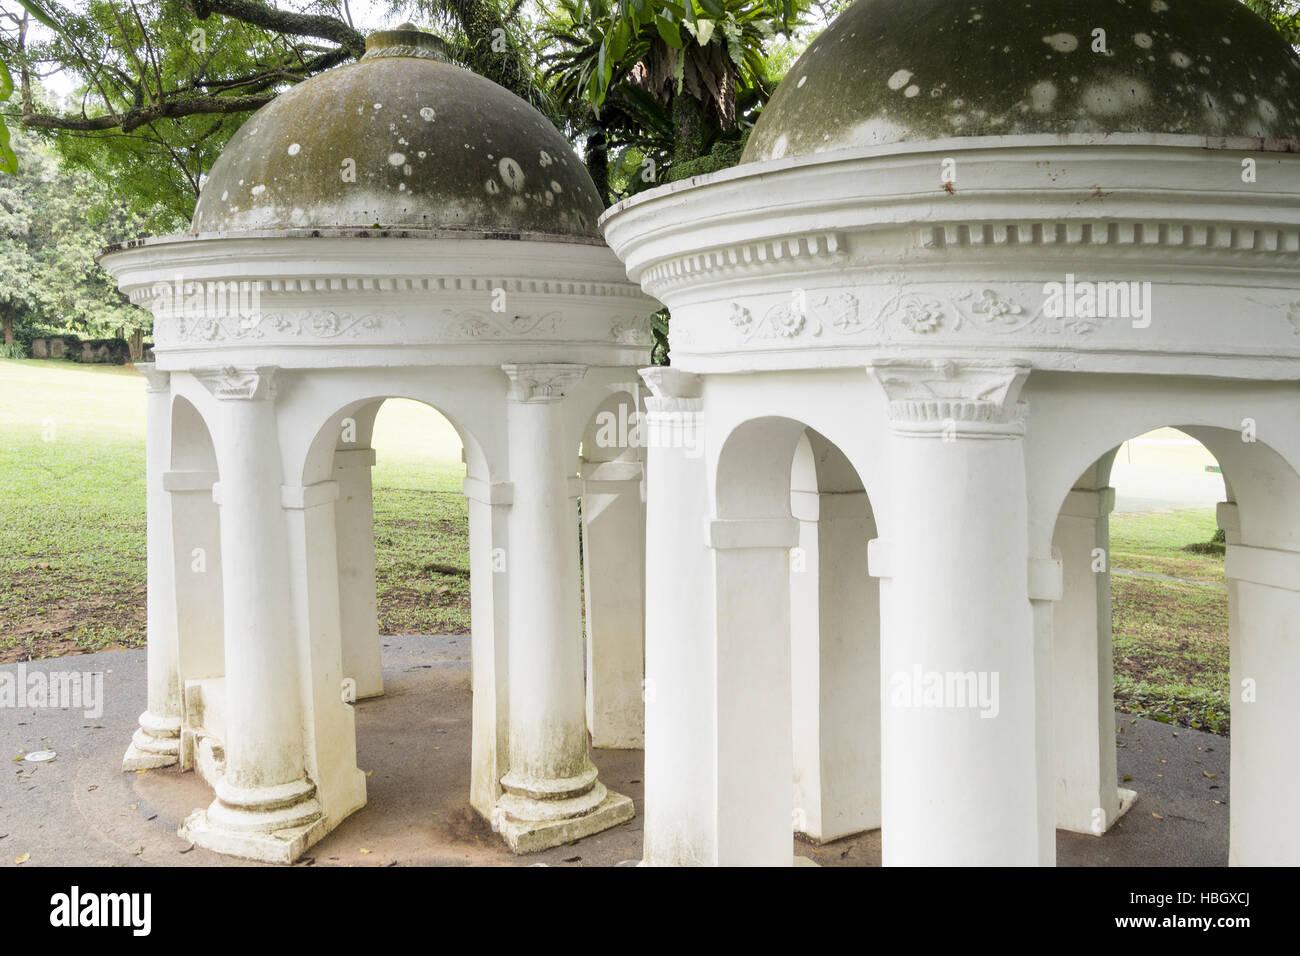 The Cupolas in Singapore - Stock Image